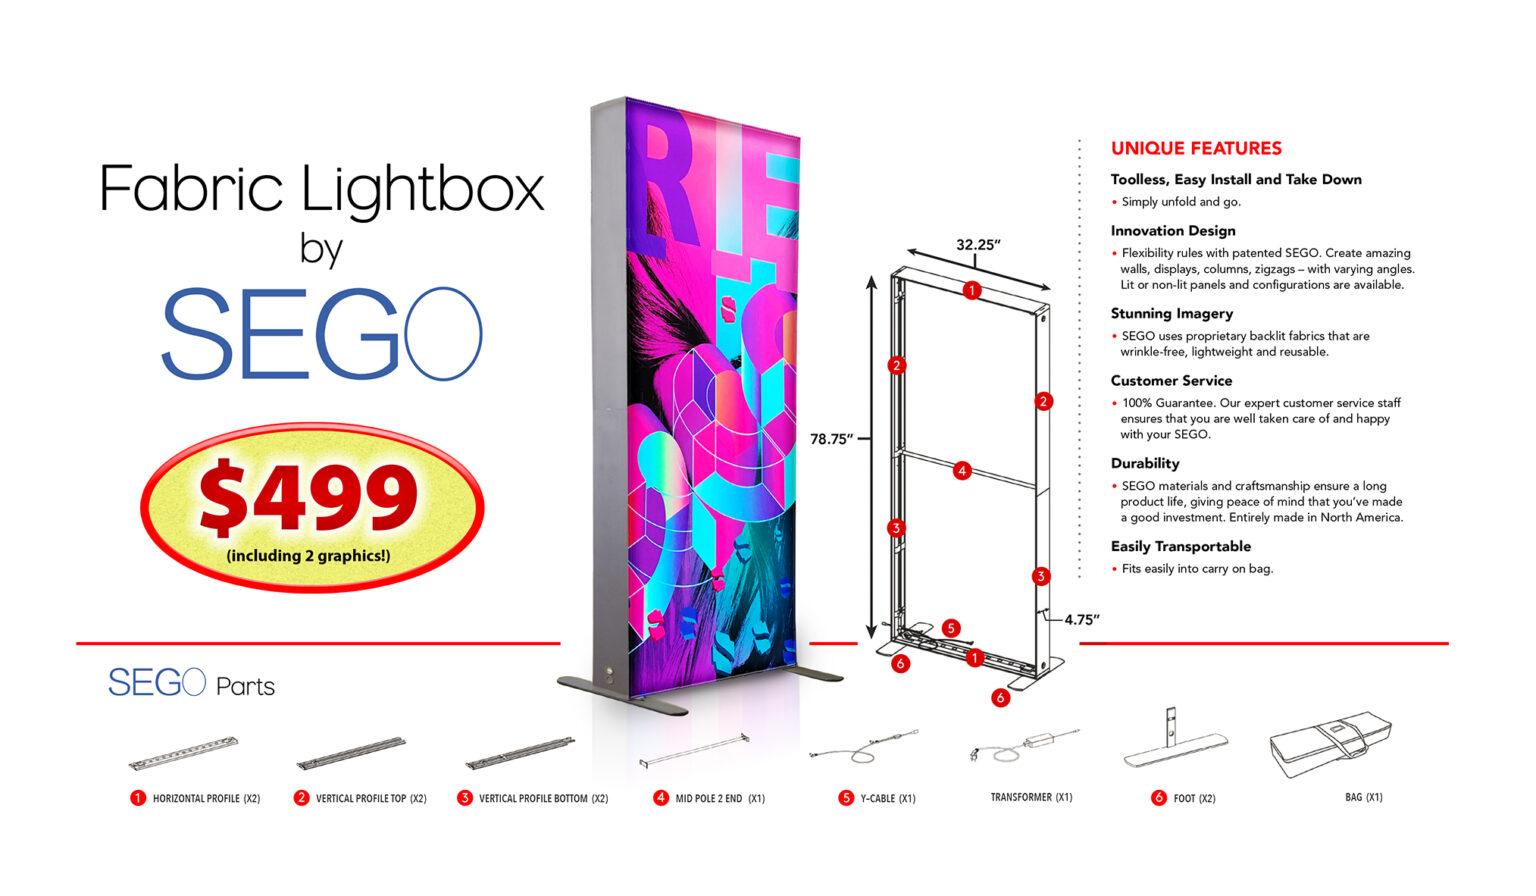 SEGO Fabric Lightbox SALE